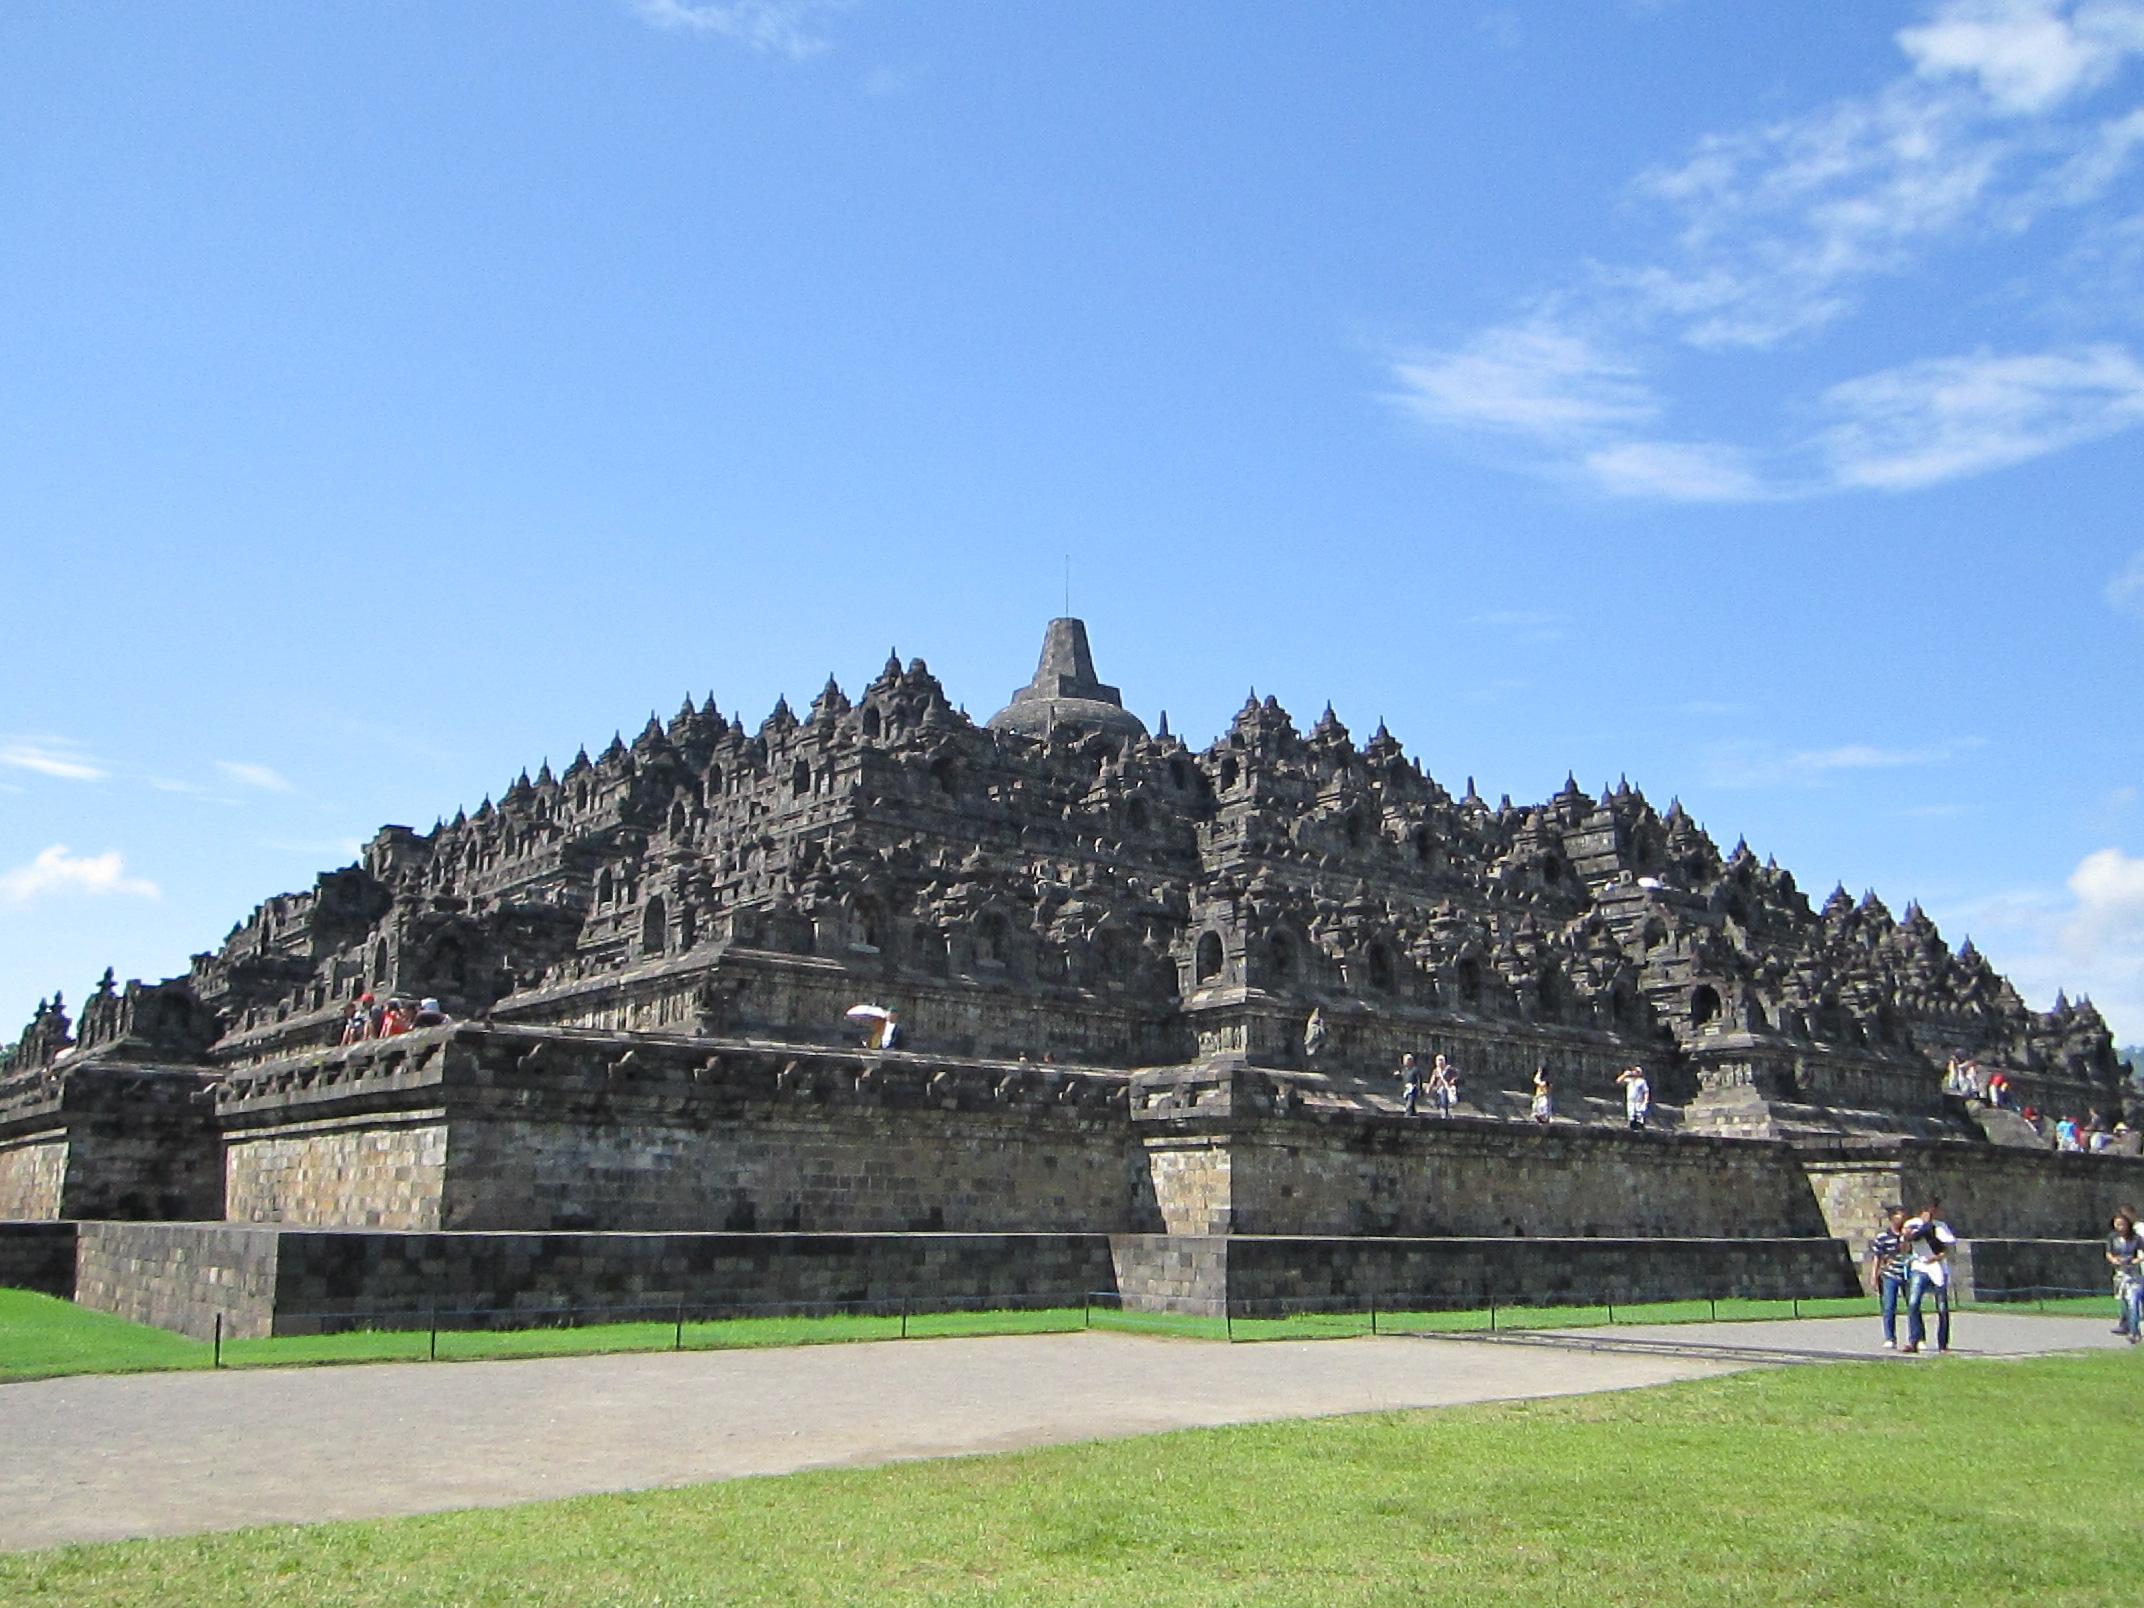 Borobudur Wikipedia Group Series Takabonerate Part 1 7 Sampai 12 September 2018